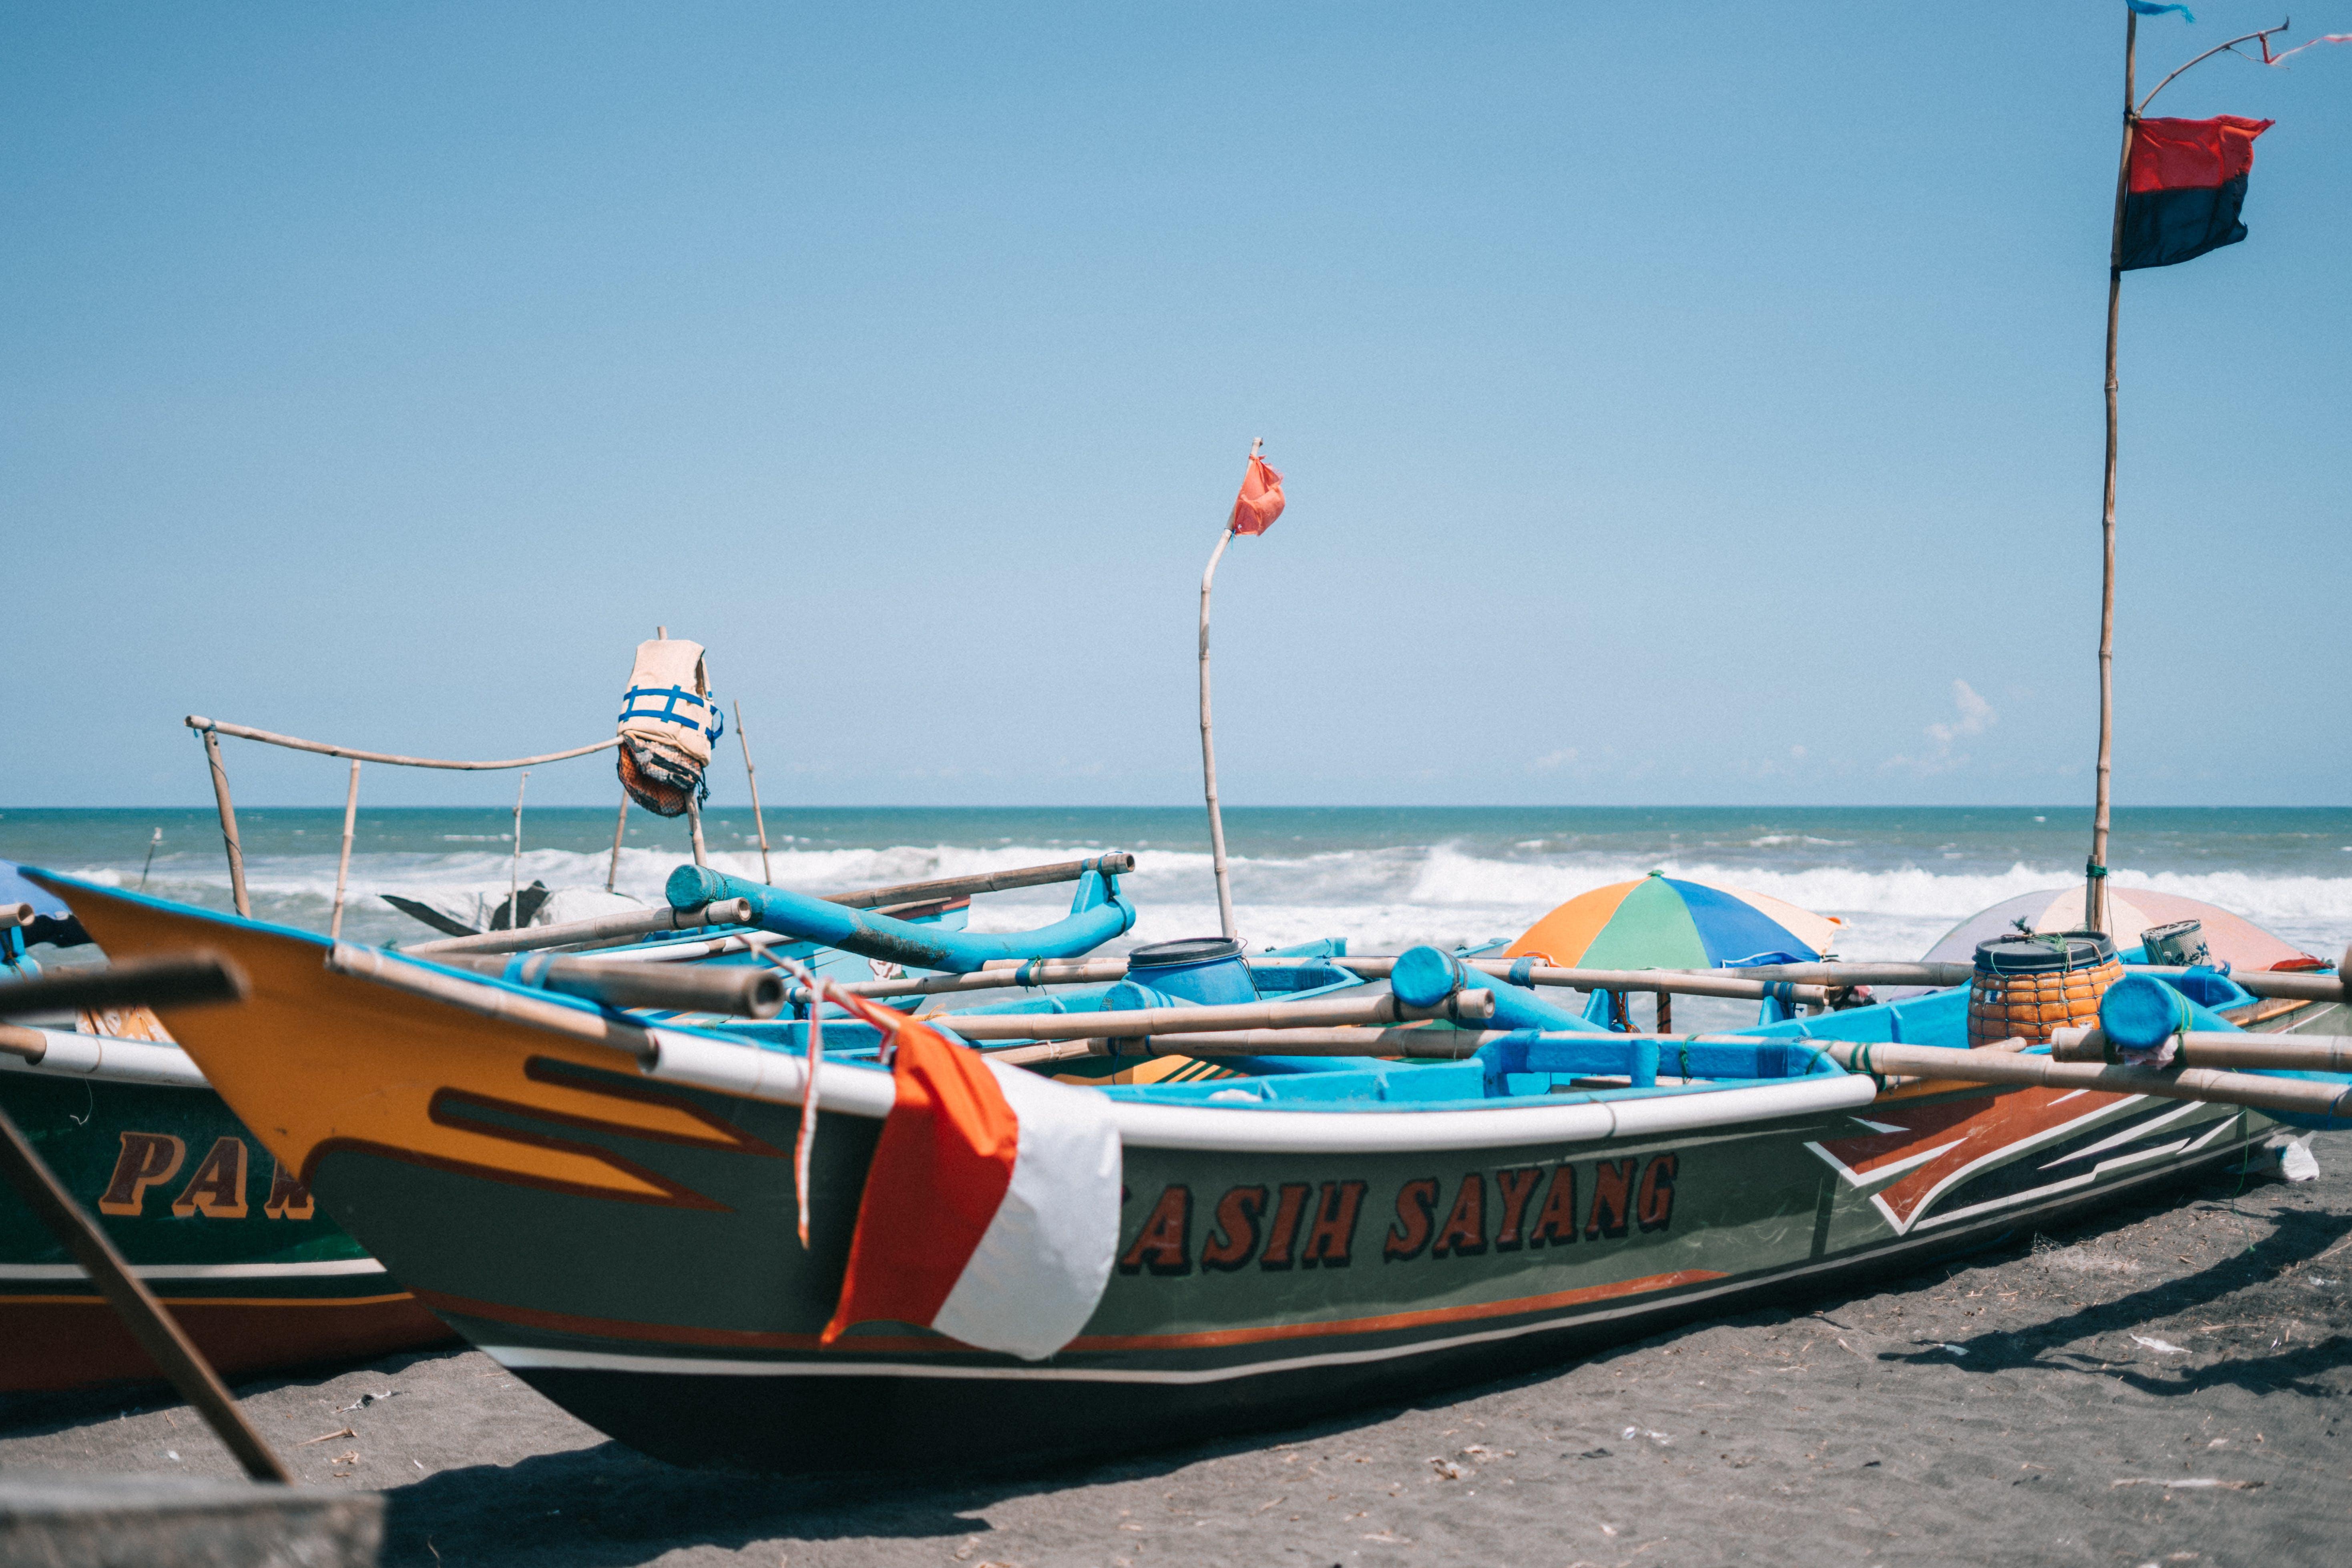 Green and Orange Boat Near Seashore